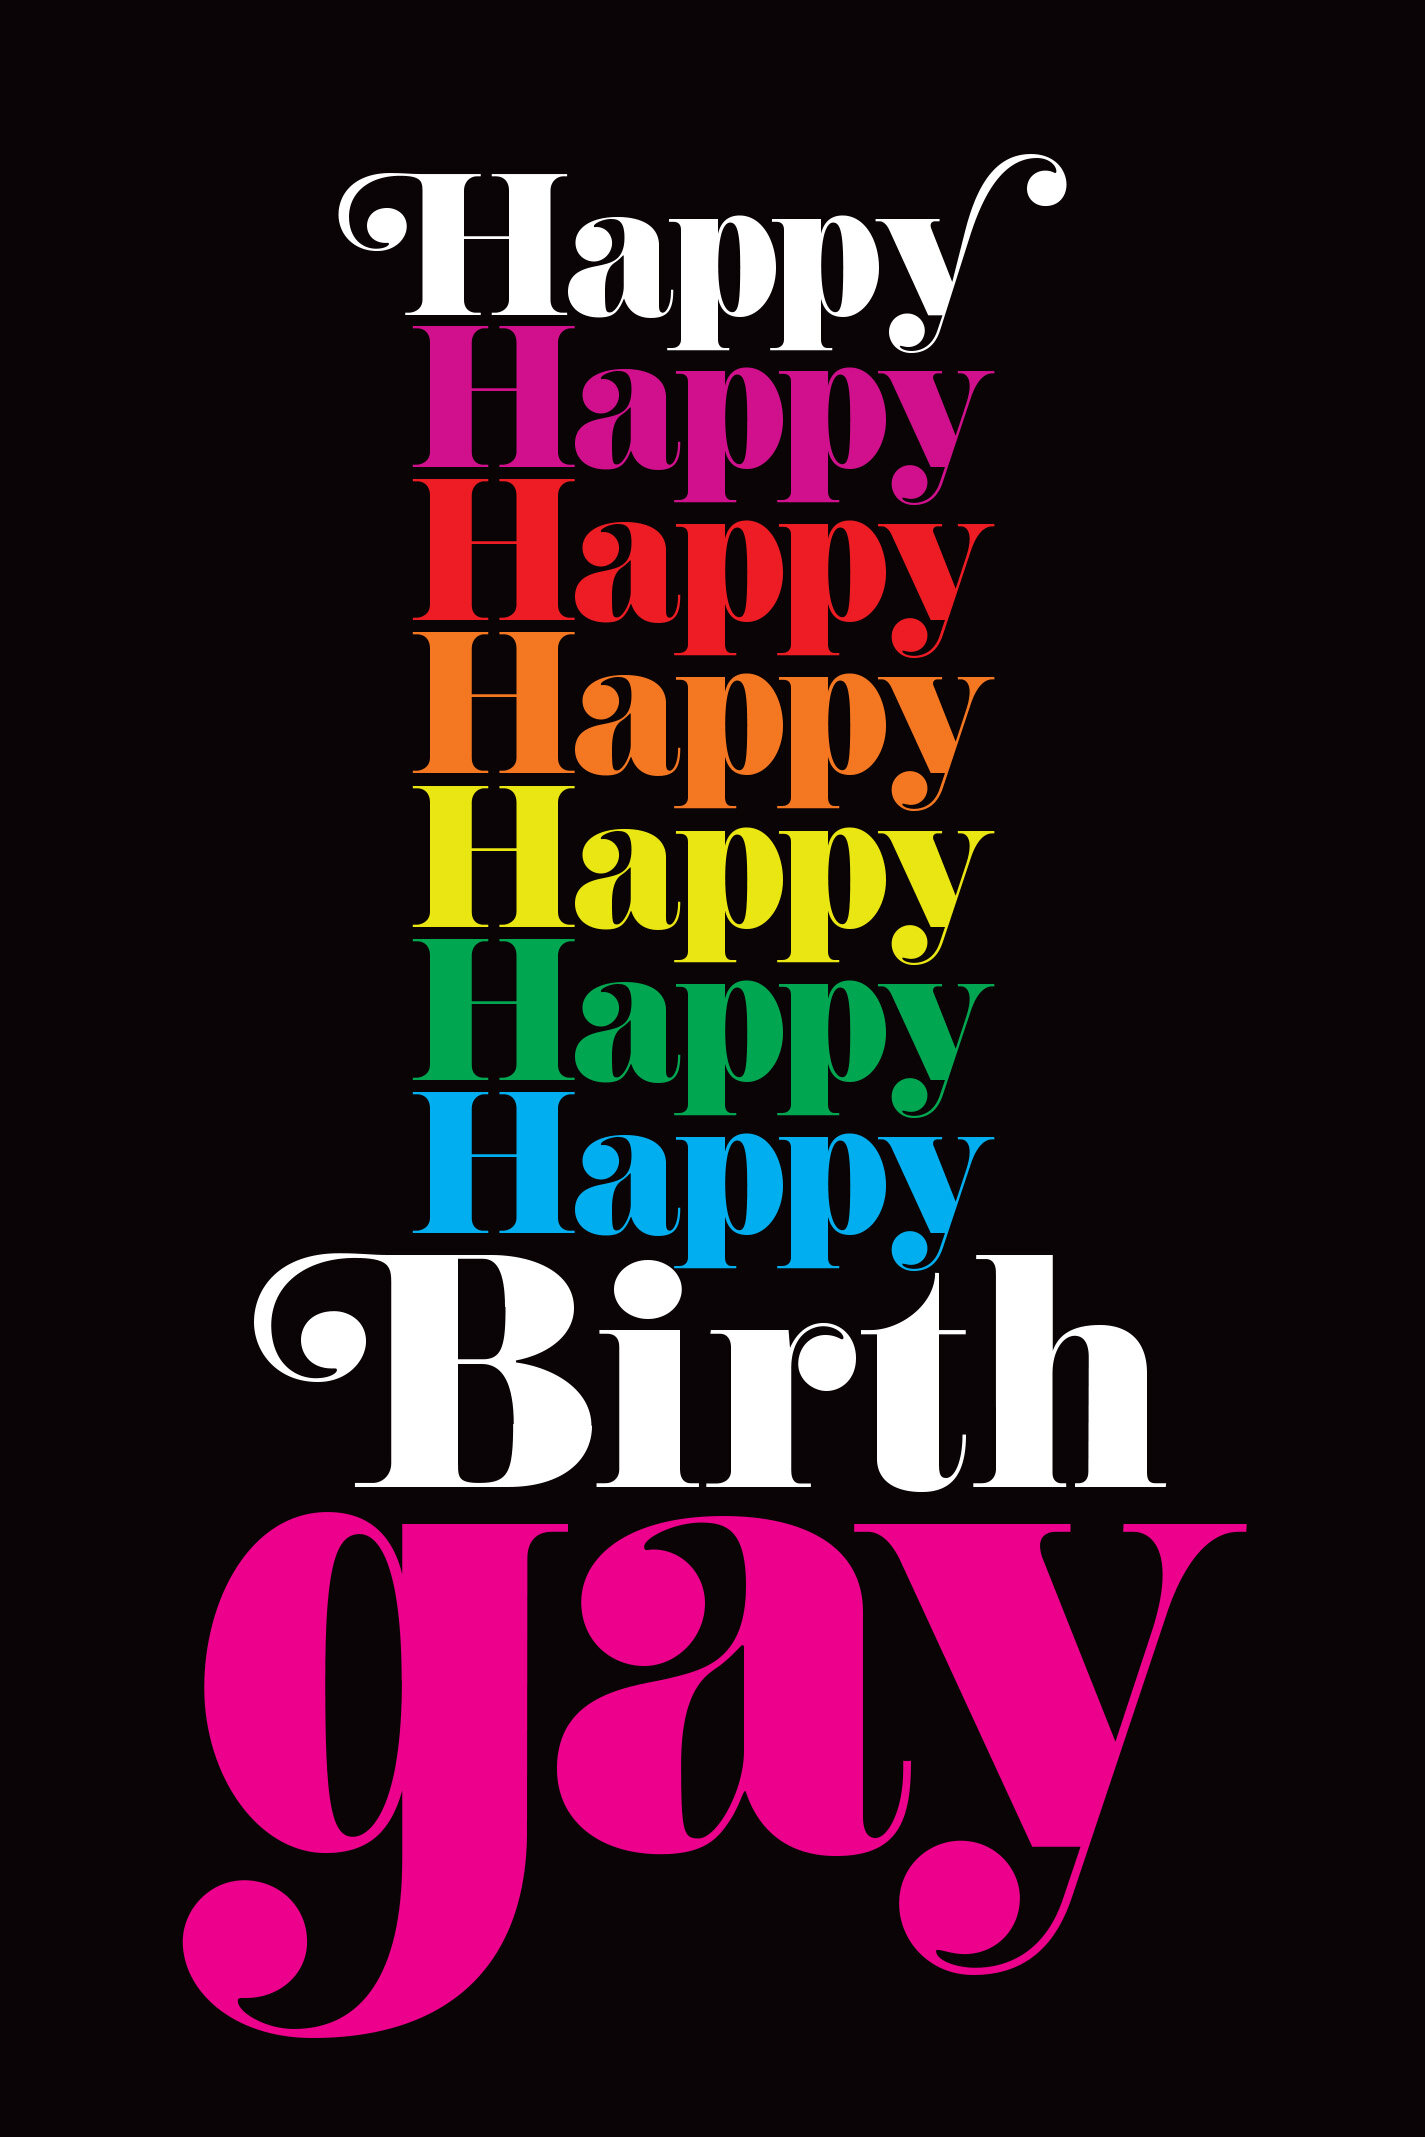 Happy BirthGay Greeting Card — Gay Greeting Cards by Kweer Cards